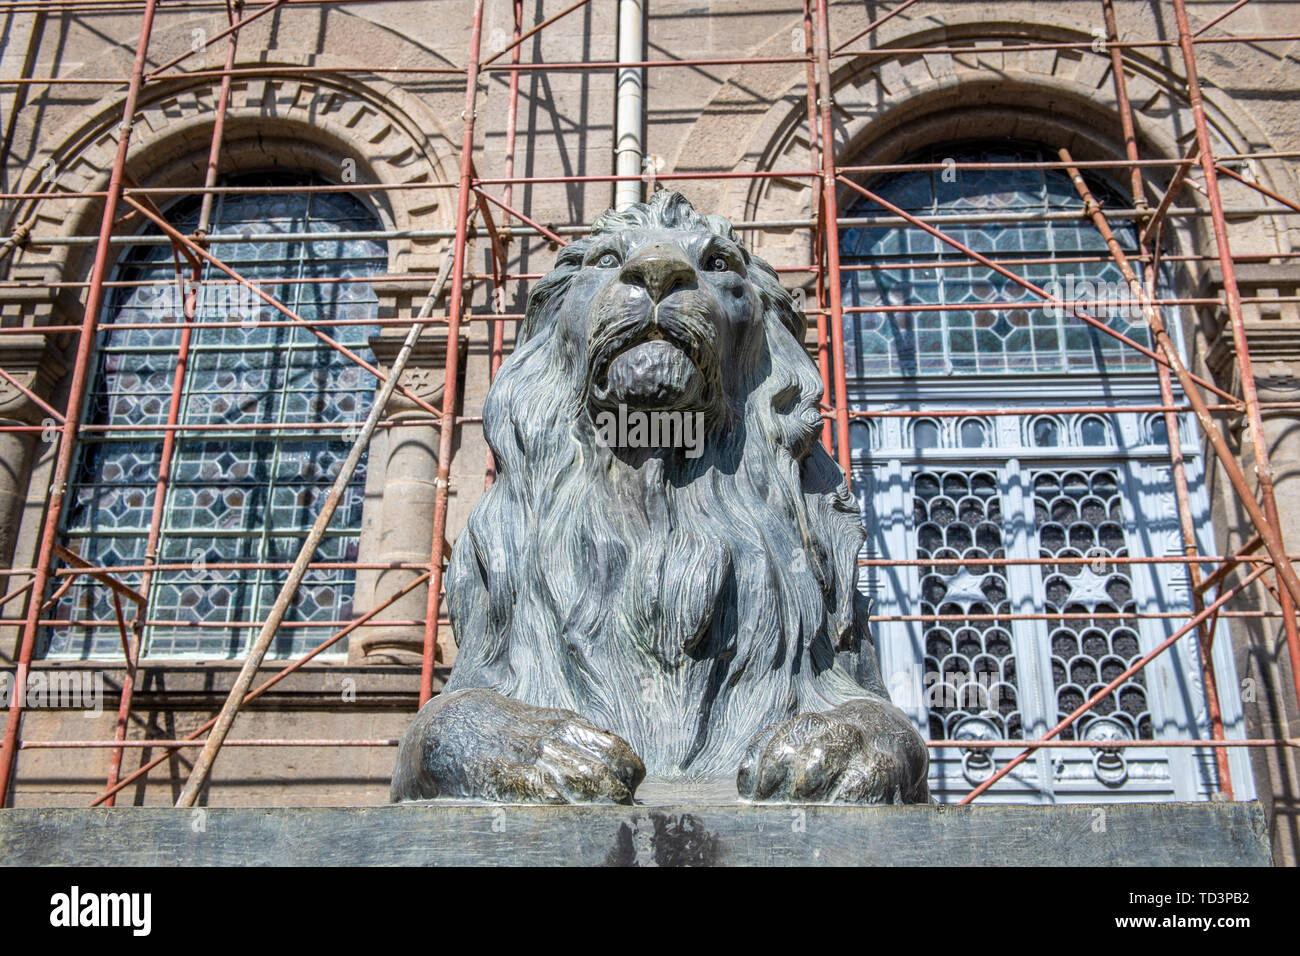 A bronze lion outside of Beata Maryam Church, Addis Ababa, Ethiopia. - Stock Image